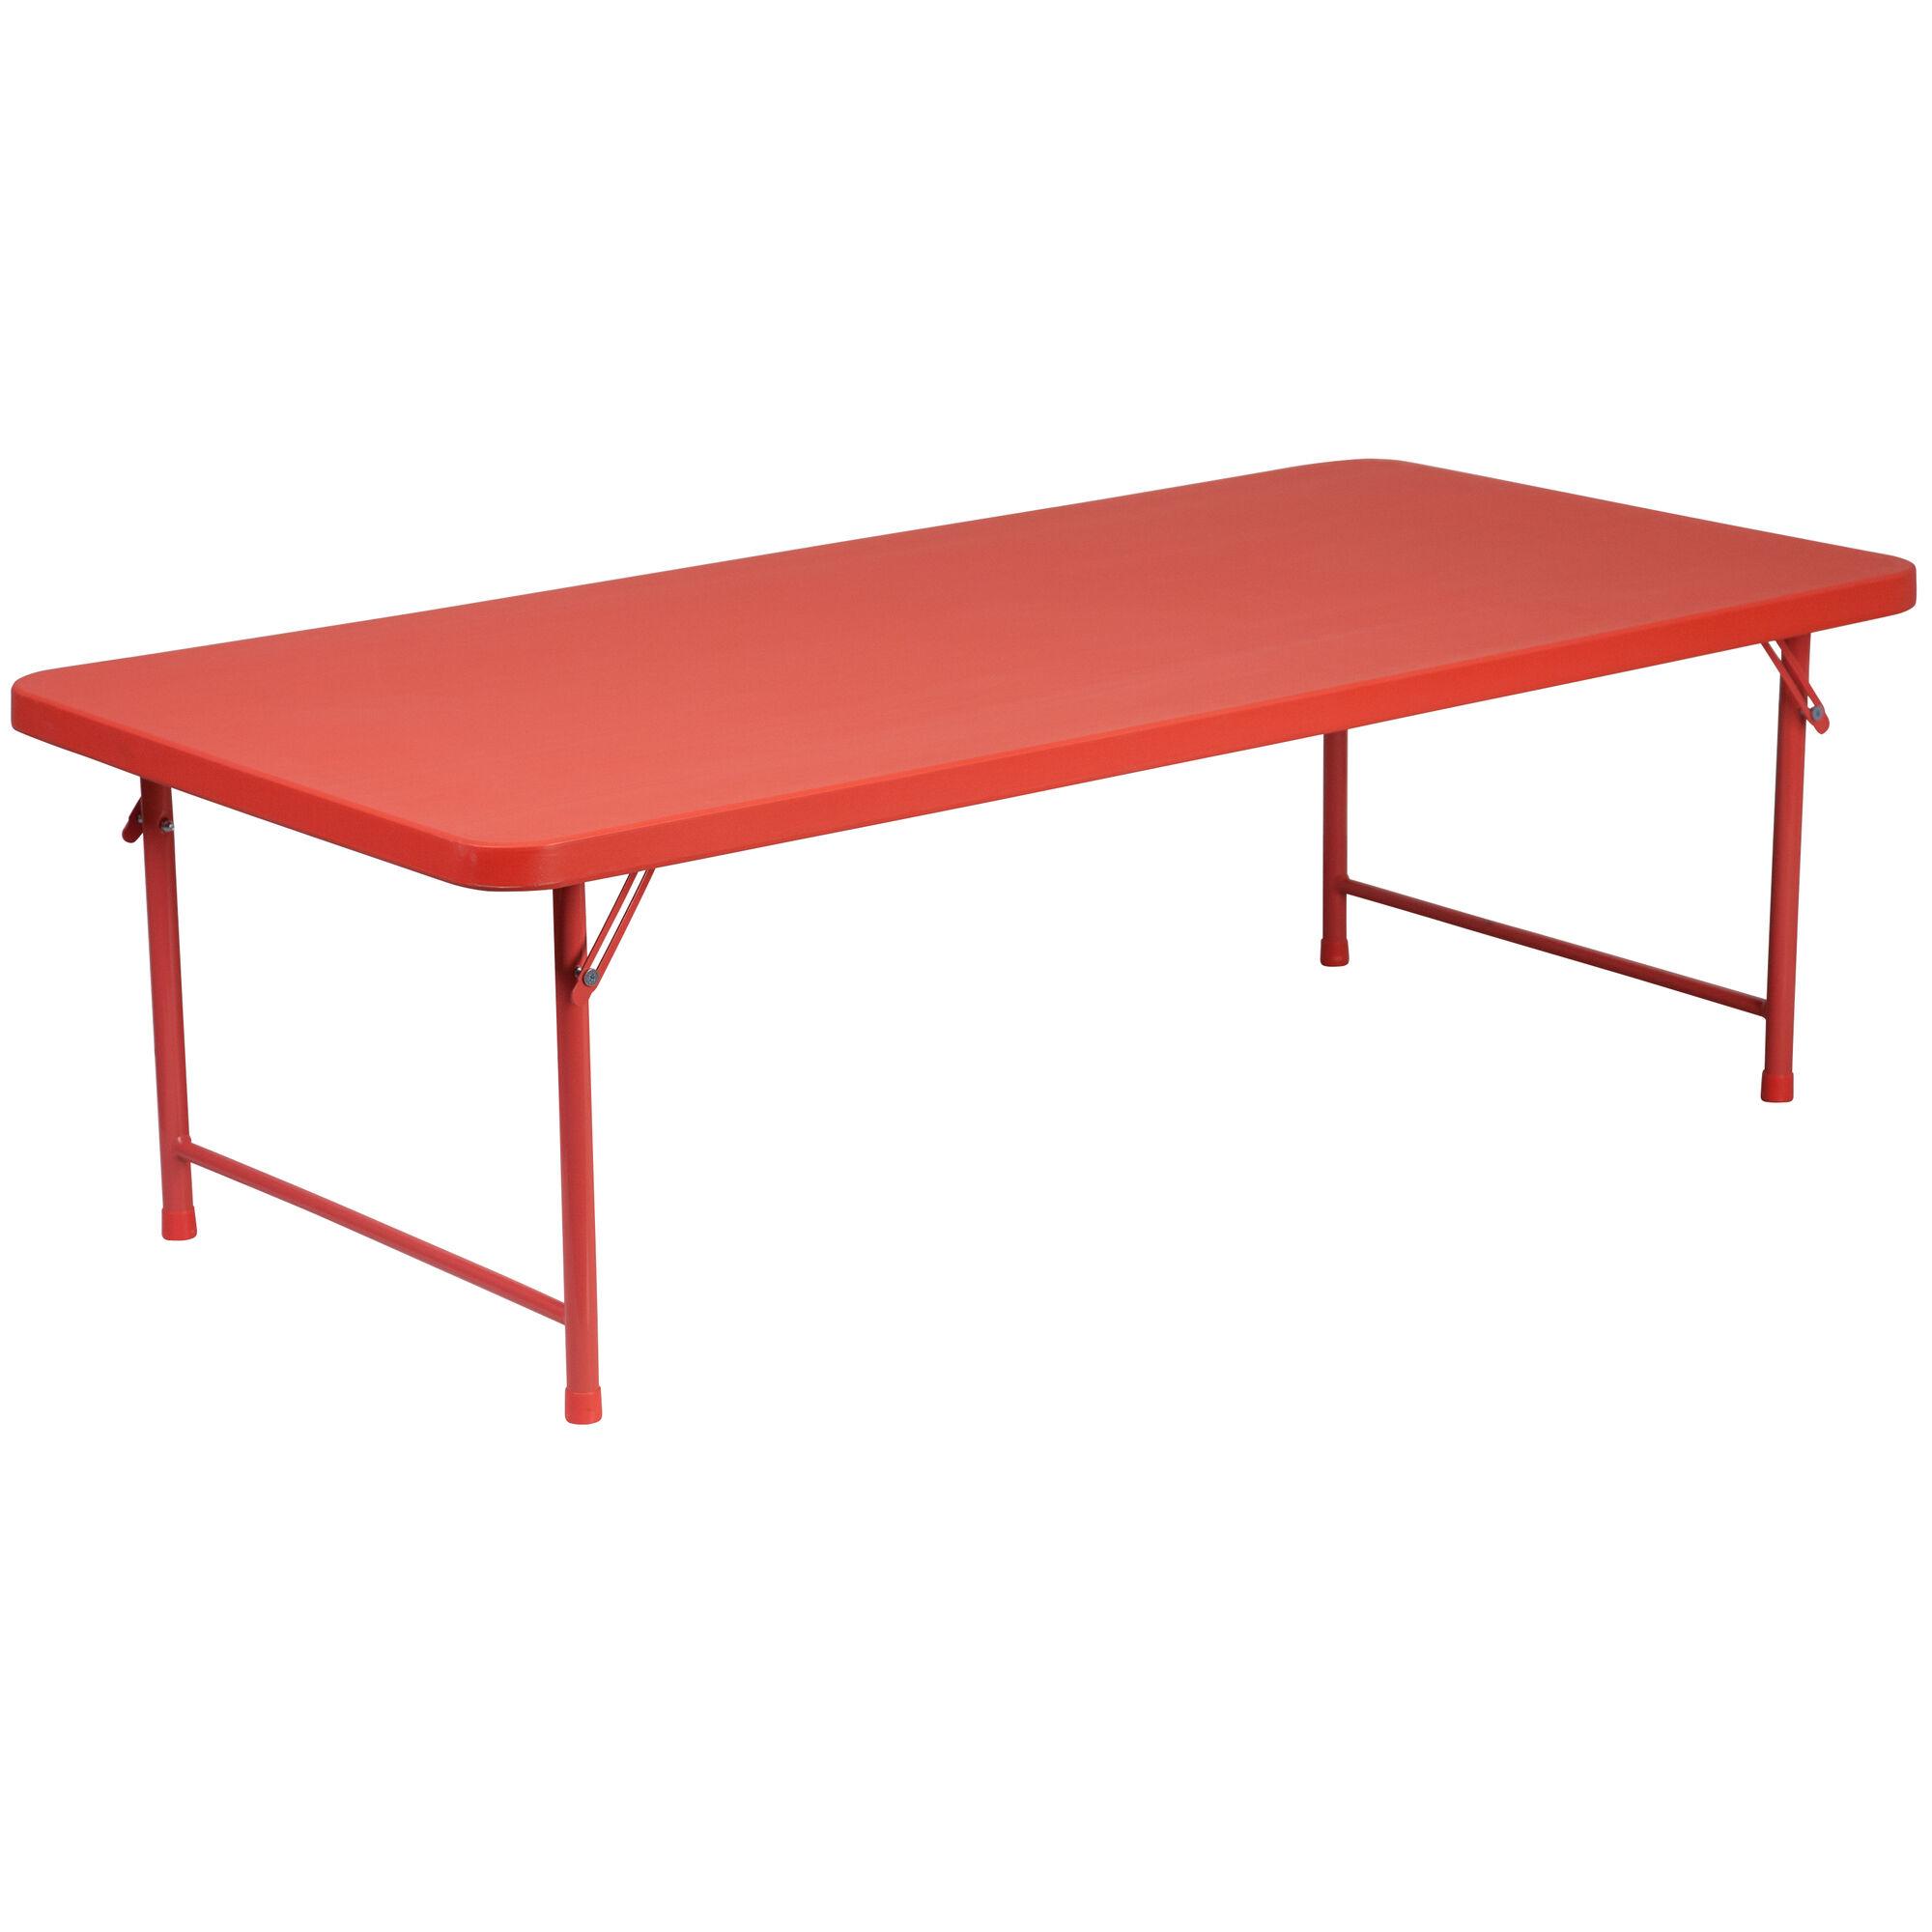 Rd plastic fold table rb kid gg